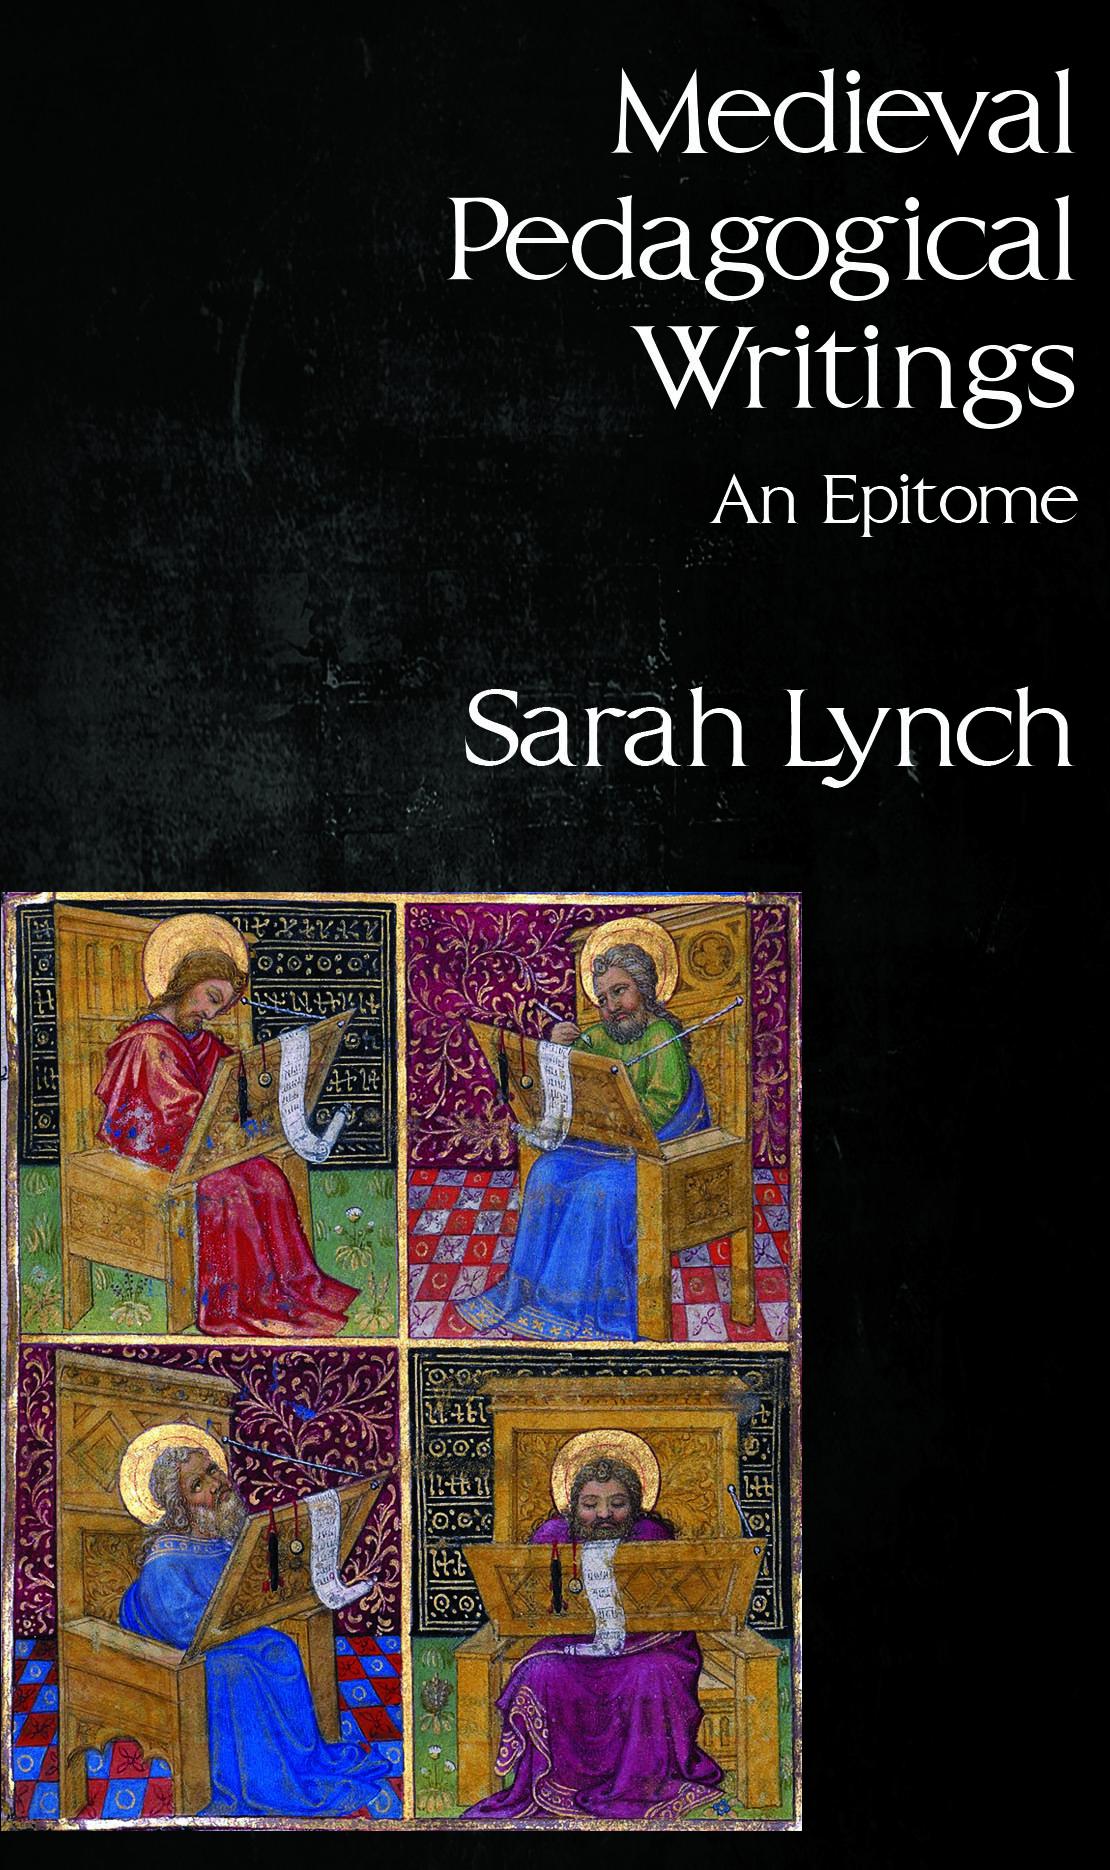 Medieval Pedagogical Writings